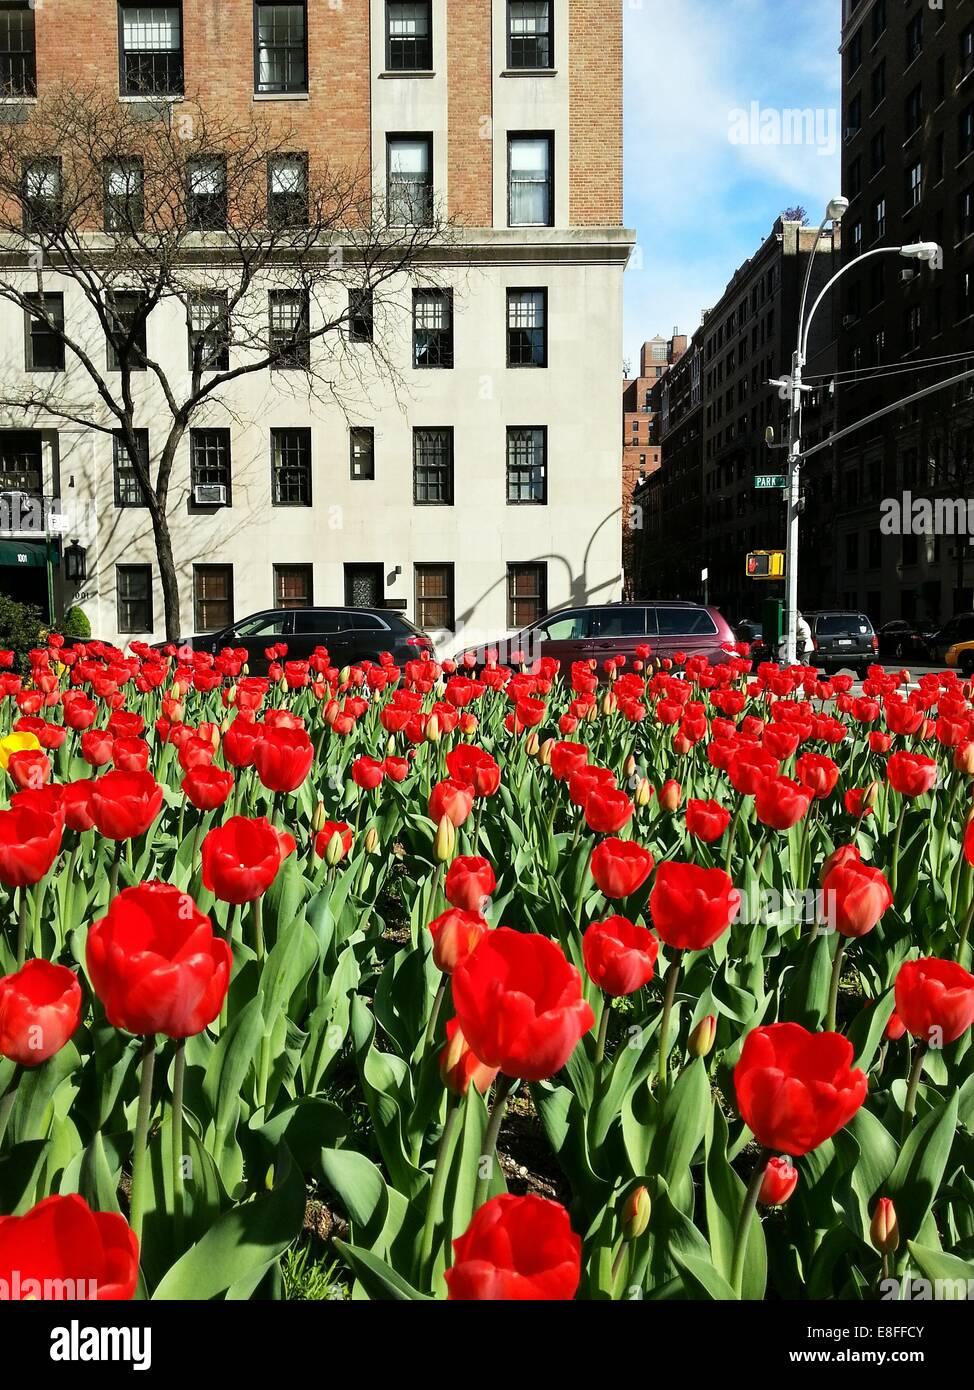 USA, New York State, New York City, Park Avenue in springtime - Stock Image